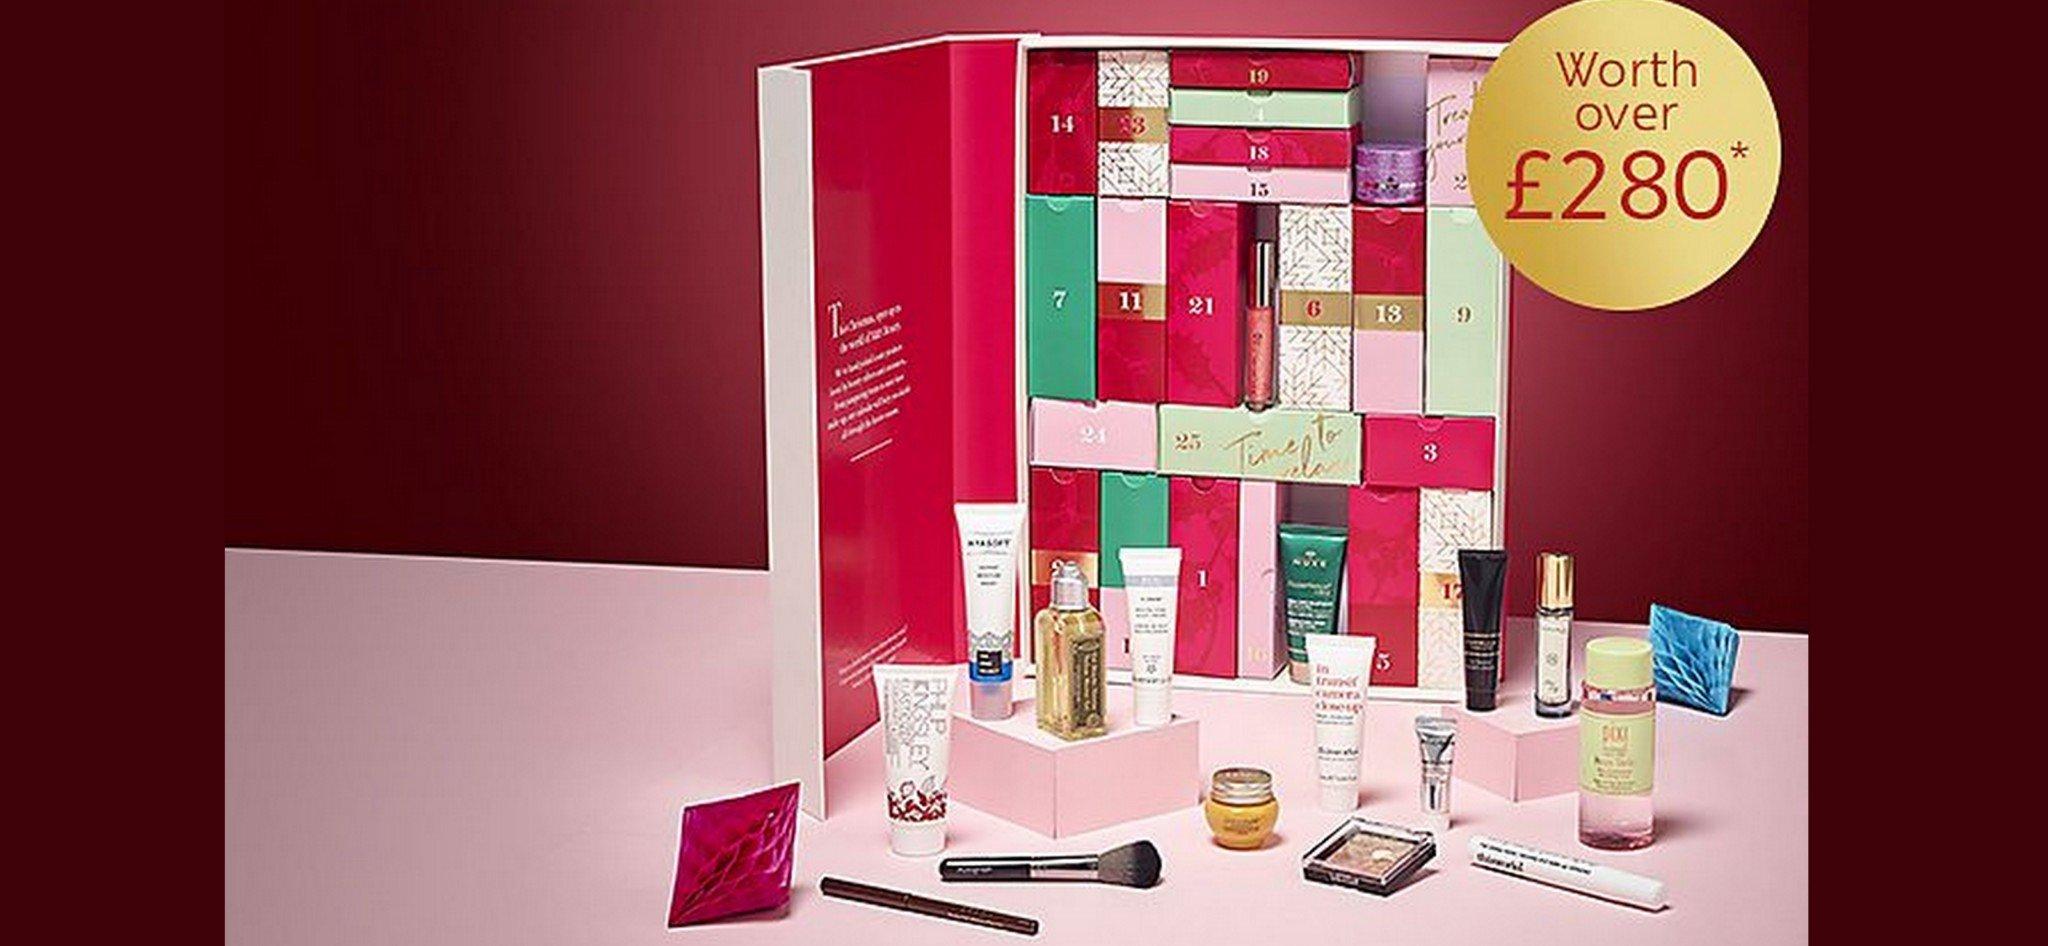 Get The £280 M&s Beauty Advent Calendar For Only £35 M&s Advent Calendar 2019